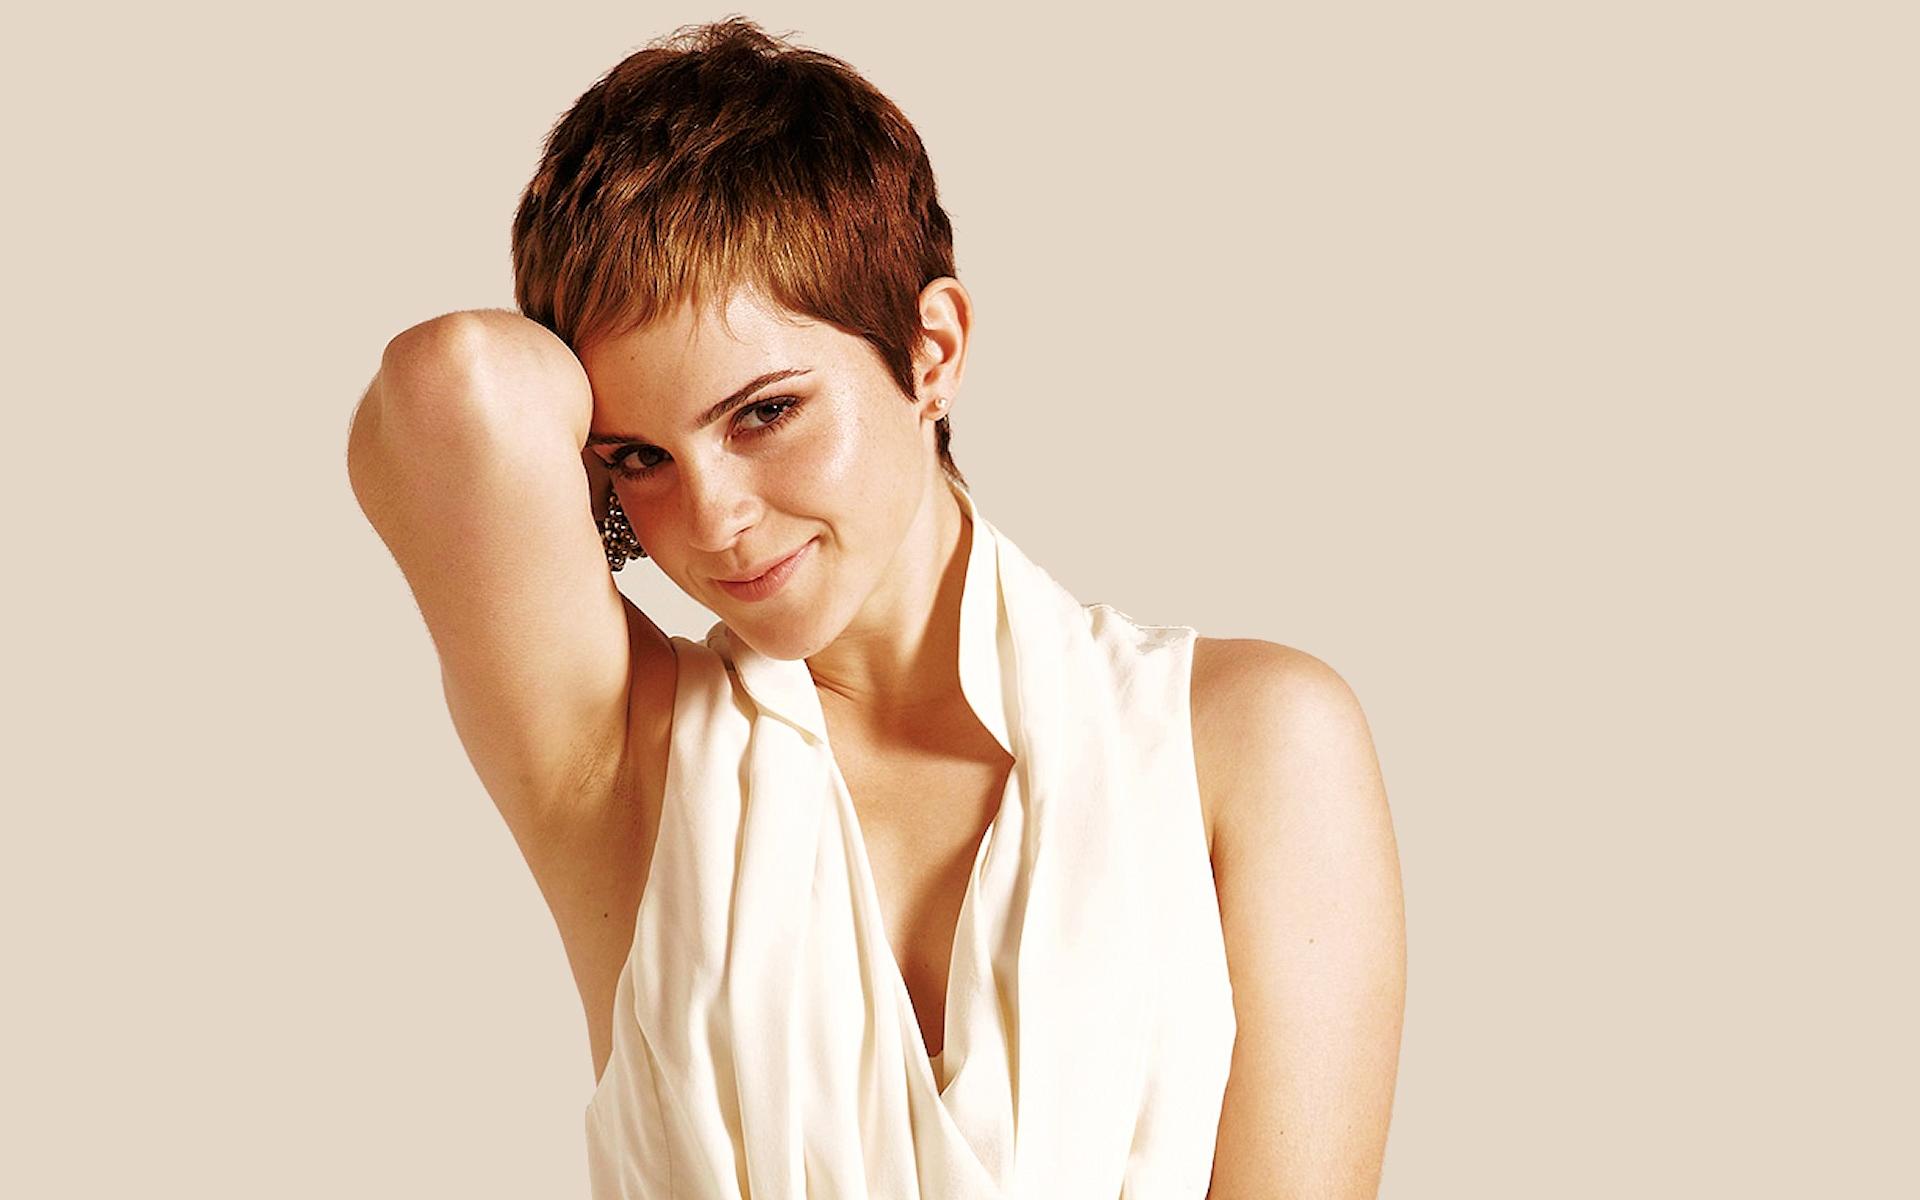 emma watson 2011 10 Hot Emma Watson Wallpapers